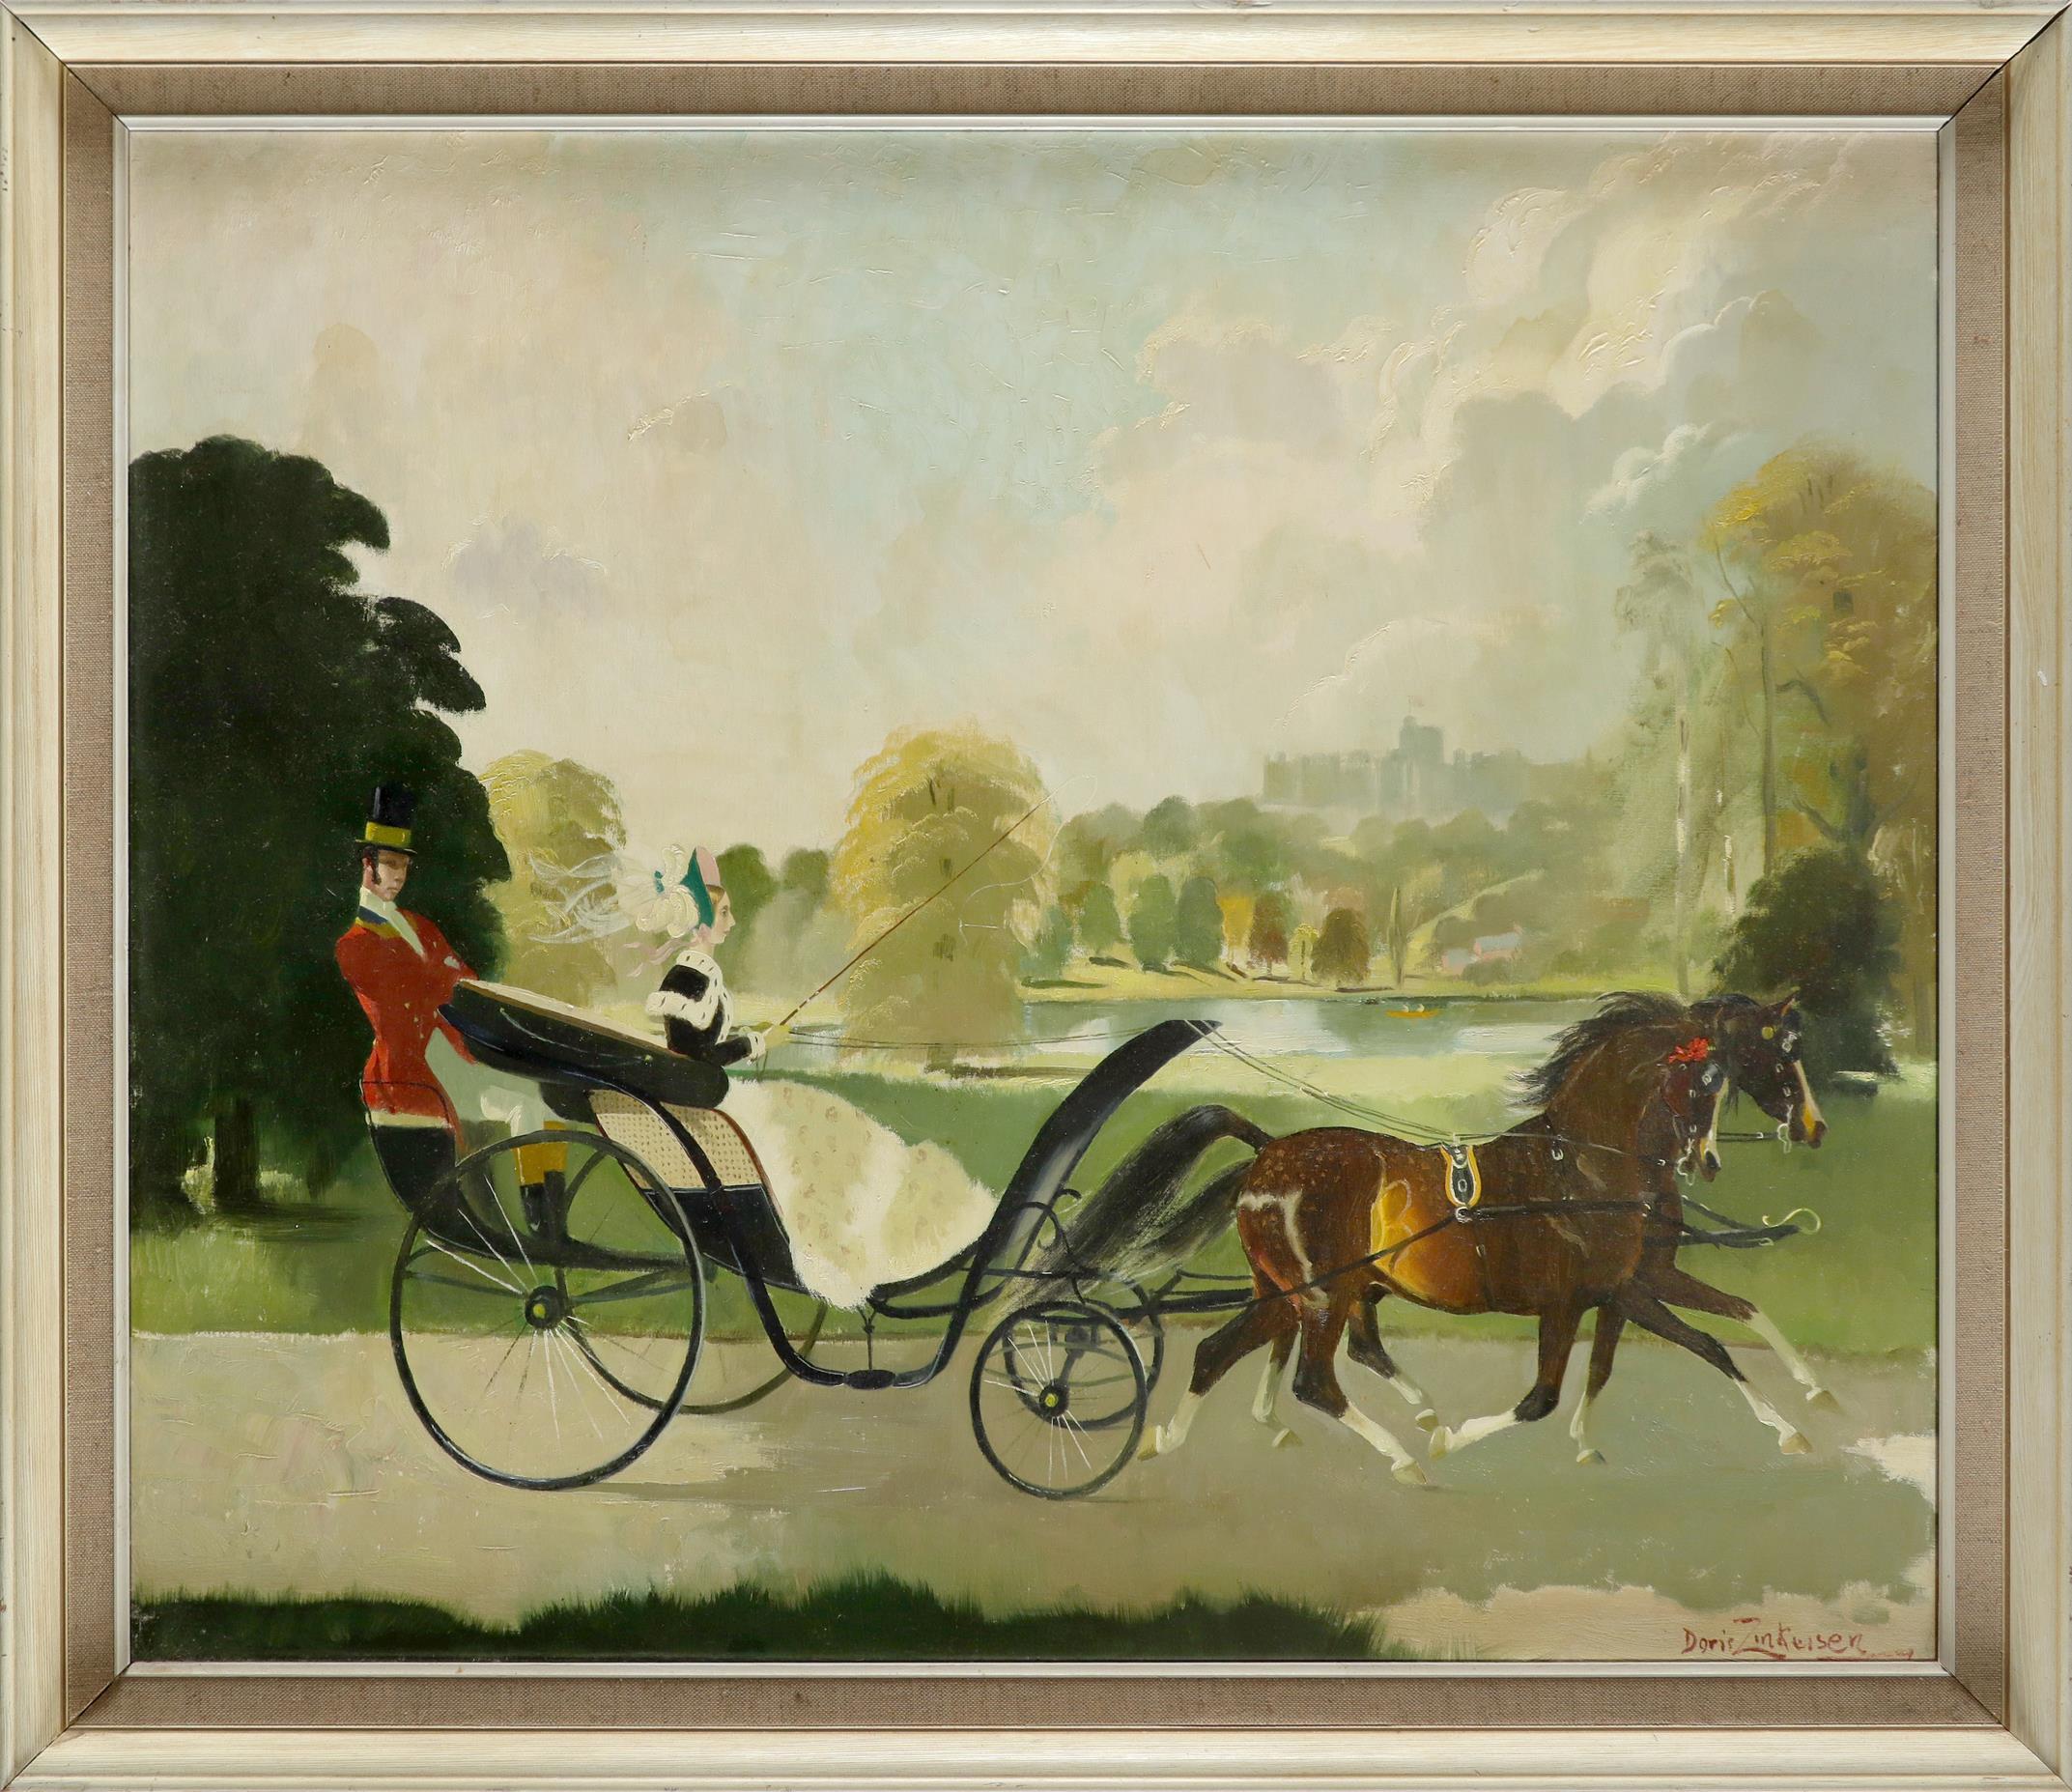 ‡Doris Zinkeisen (Scottish 1898-1991) Riding near Windsor Signed Doris Zinkeisen (lower right) Oil - Image 2 of 3